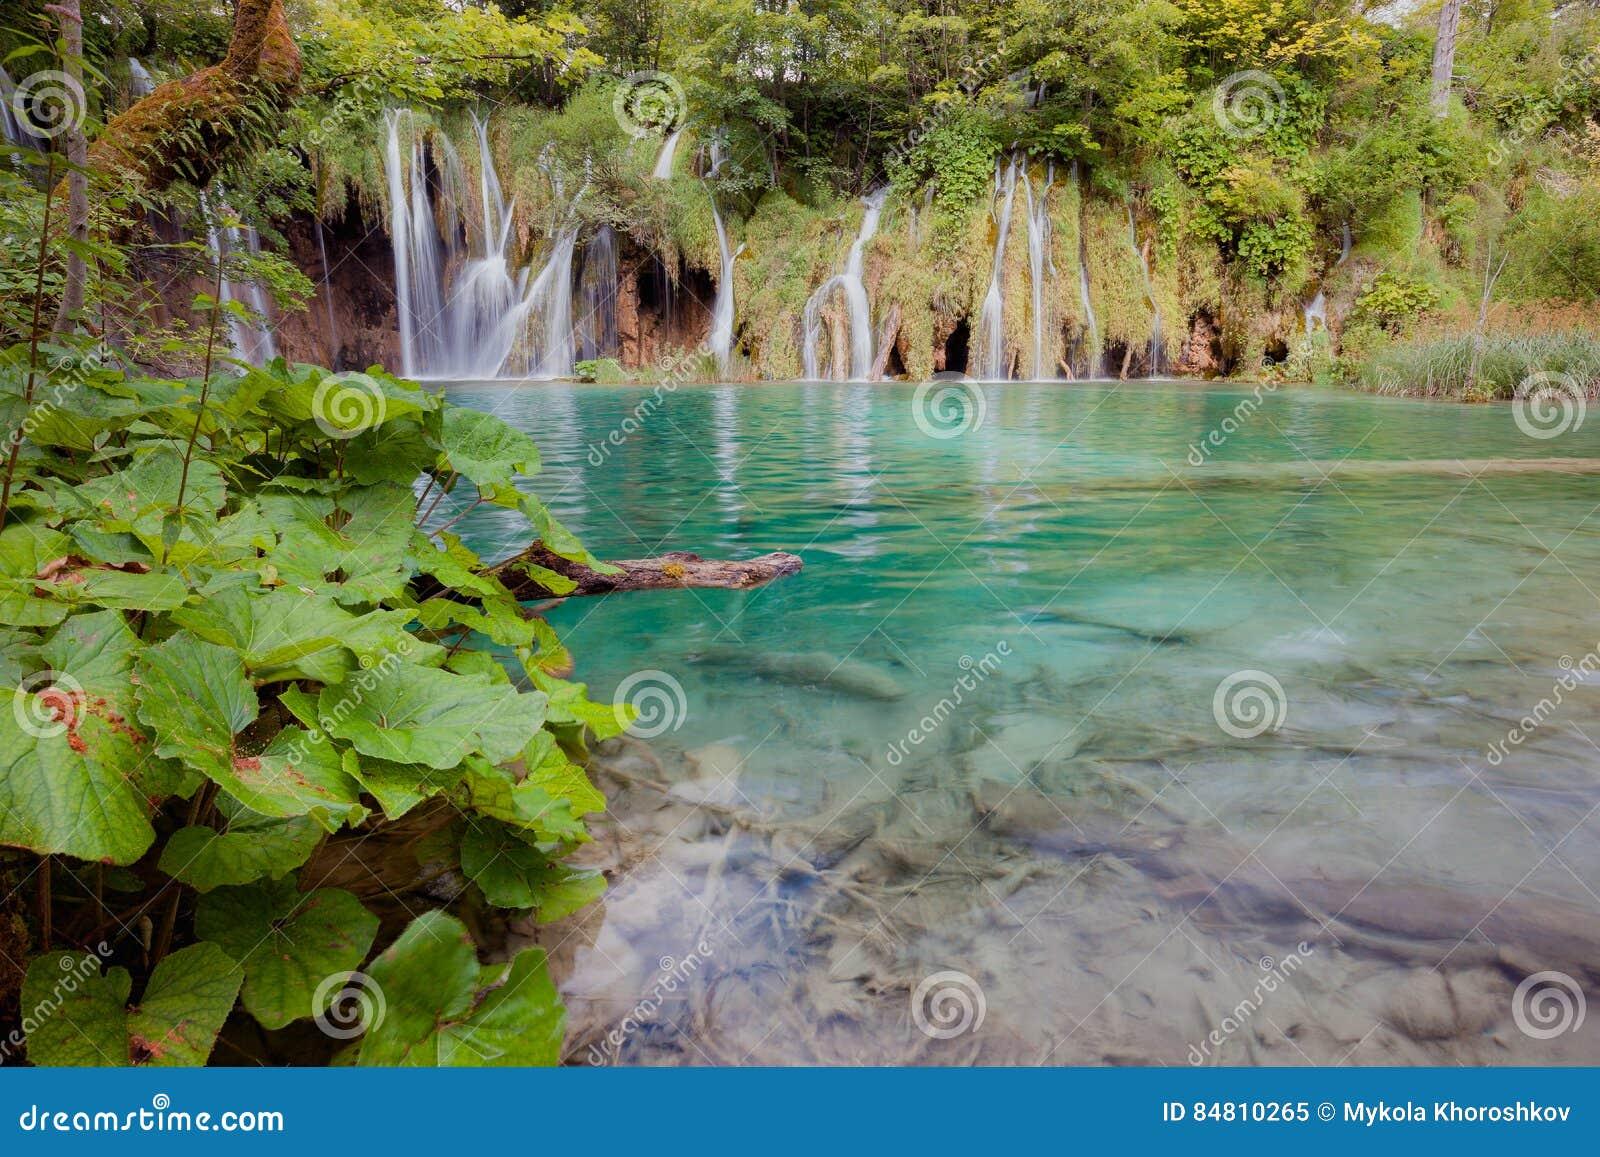 Download Beautiful Tropical Waterfall Stock Image - Image of creek, lake: 84810265